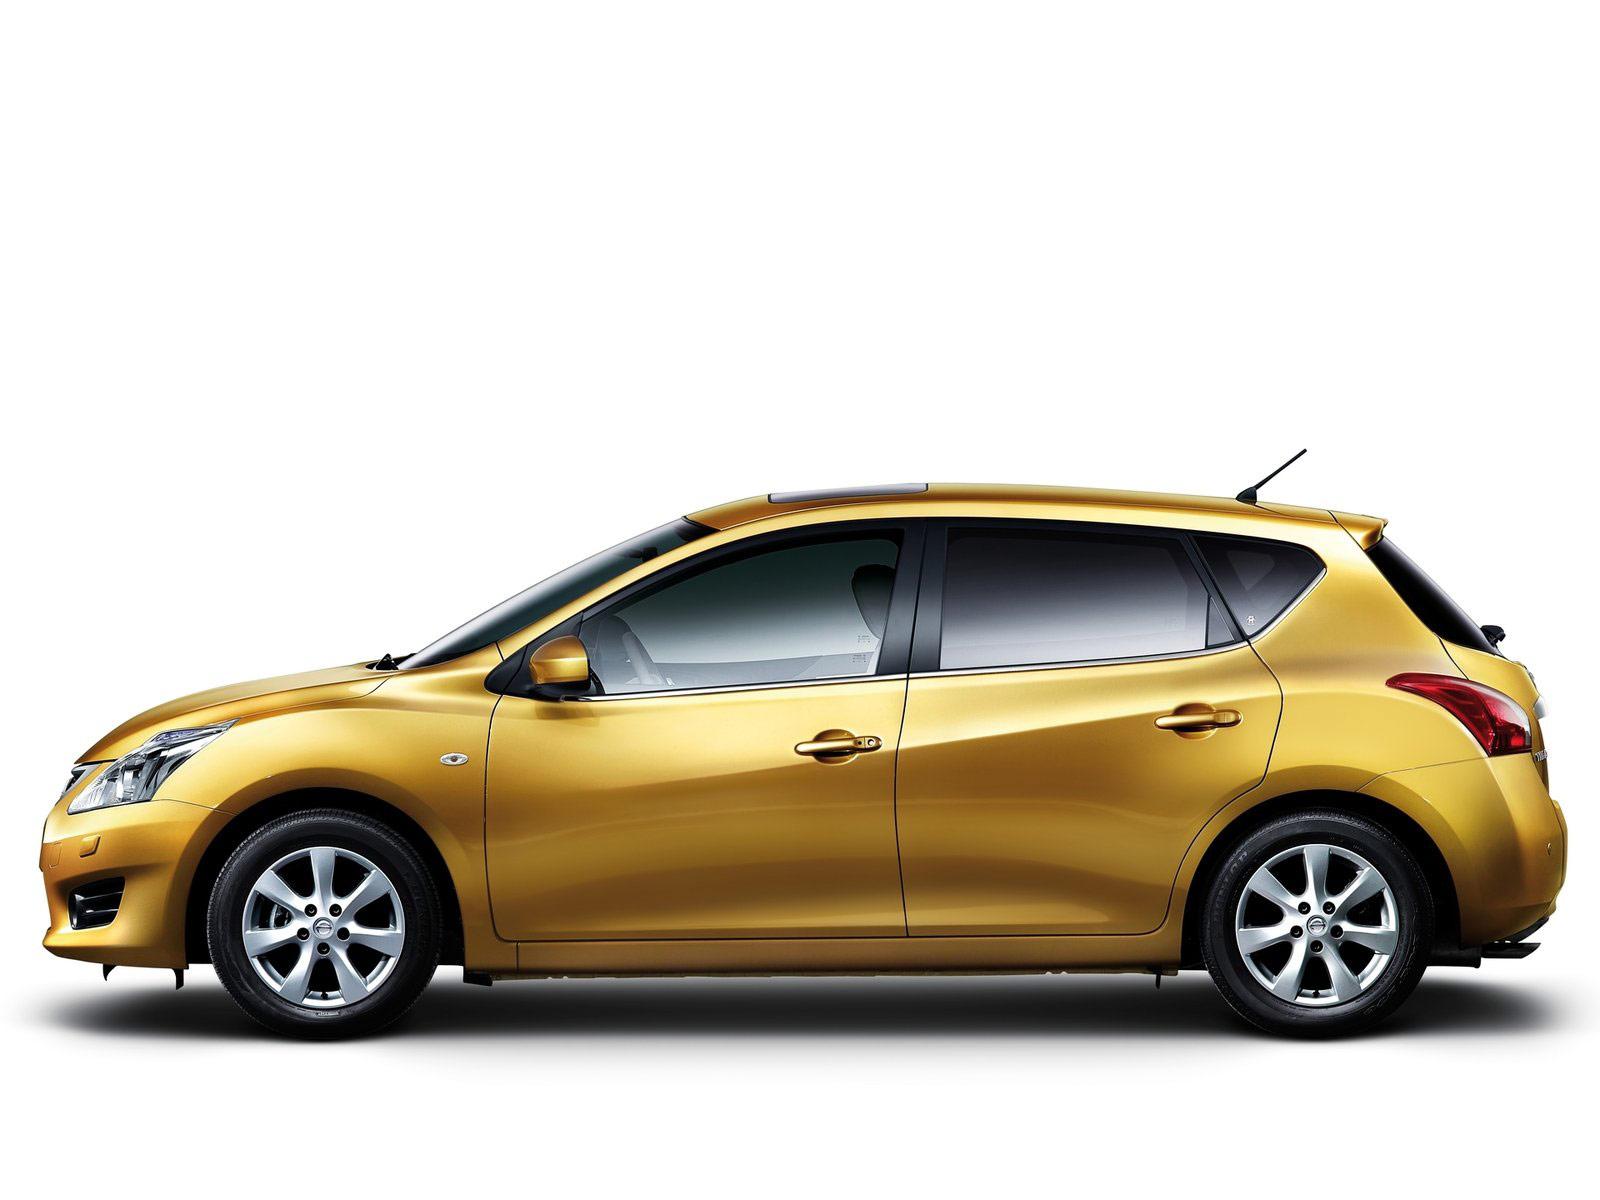 2012_Nissan-Tiida_japanese-car-wallpaper